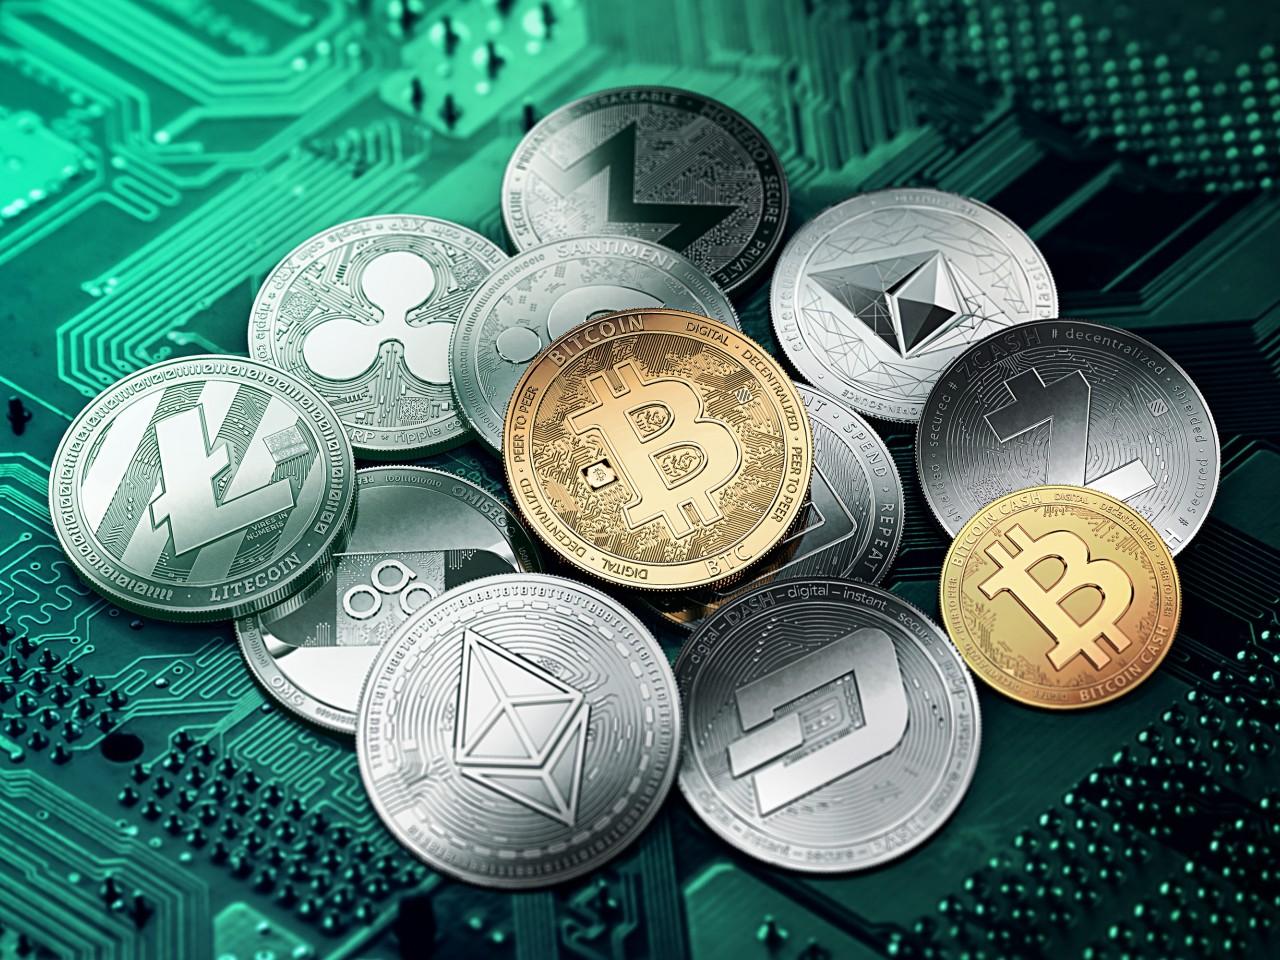 bitcoin btcden daha iyi performans göstermesi beklenen altcoinler